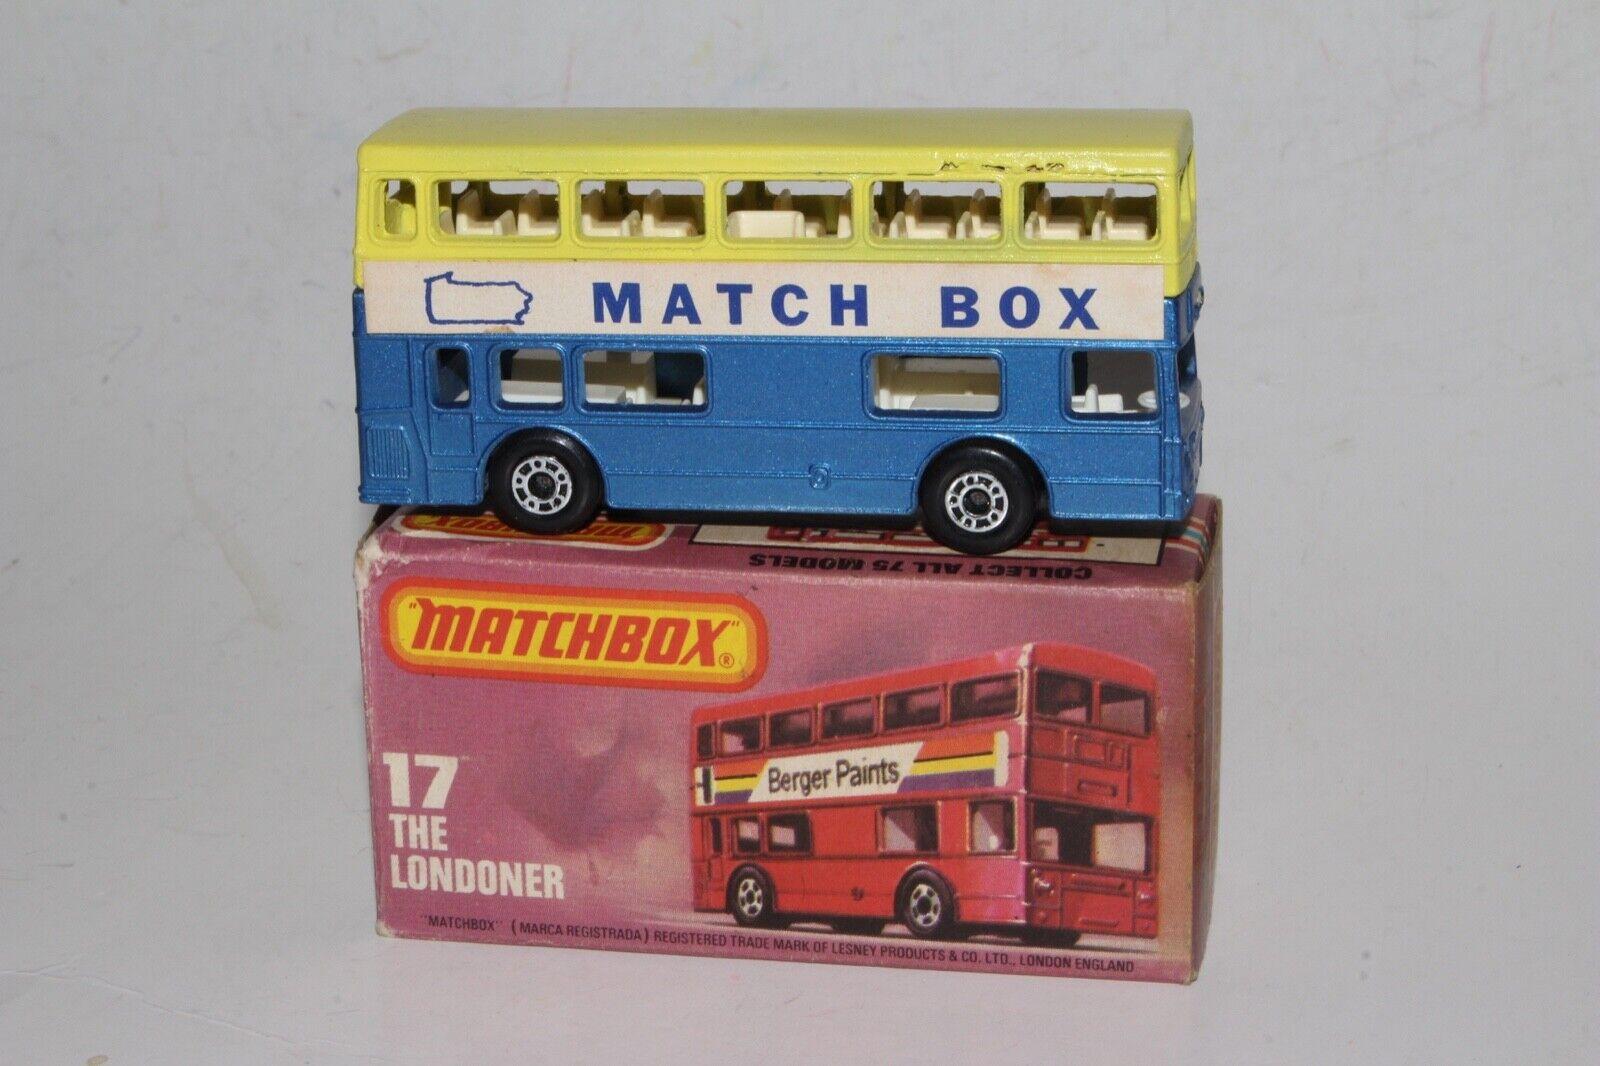 Matchbox Superfast Londoner Autobús de Dos Pisos, Raro 1981 Coleccionista